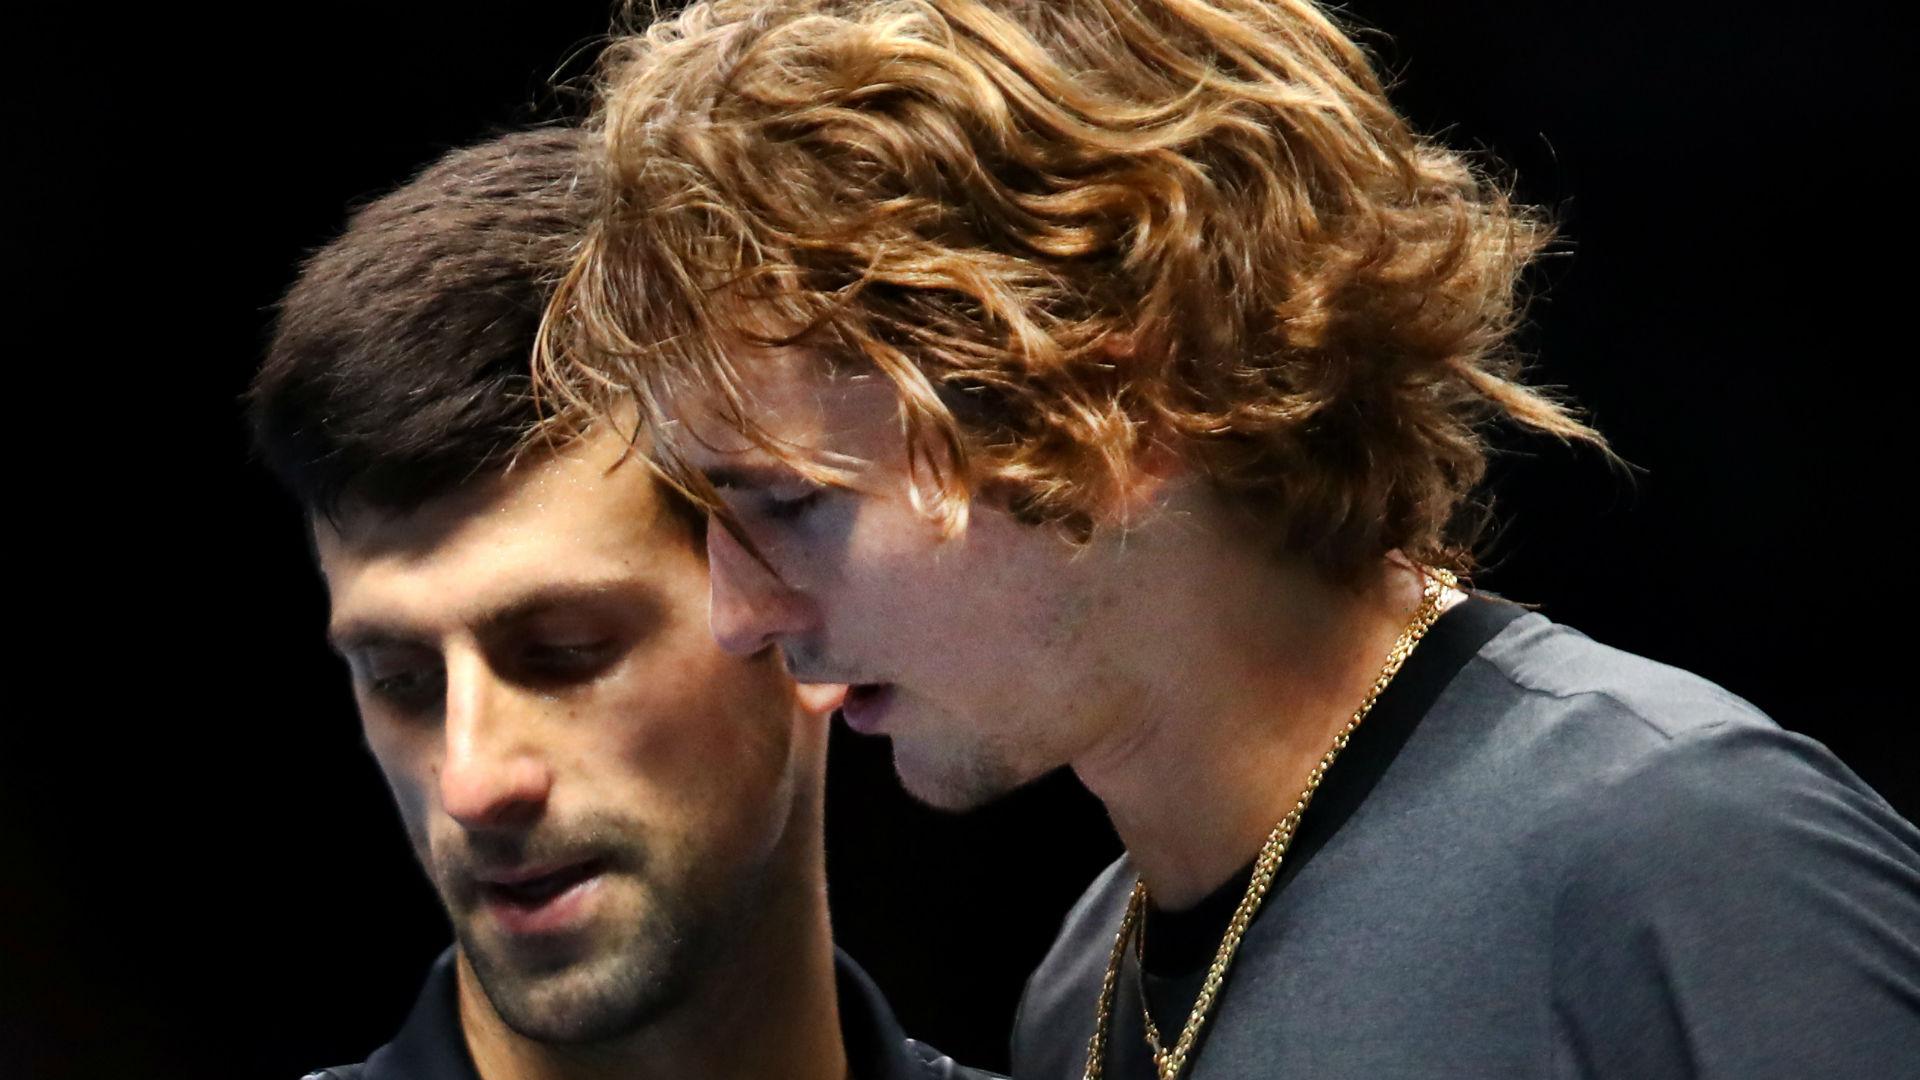 ATP Finals: No 'breathtaking tennis' in Novak Djokovic's win against Alexander Zverev